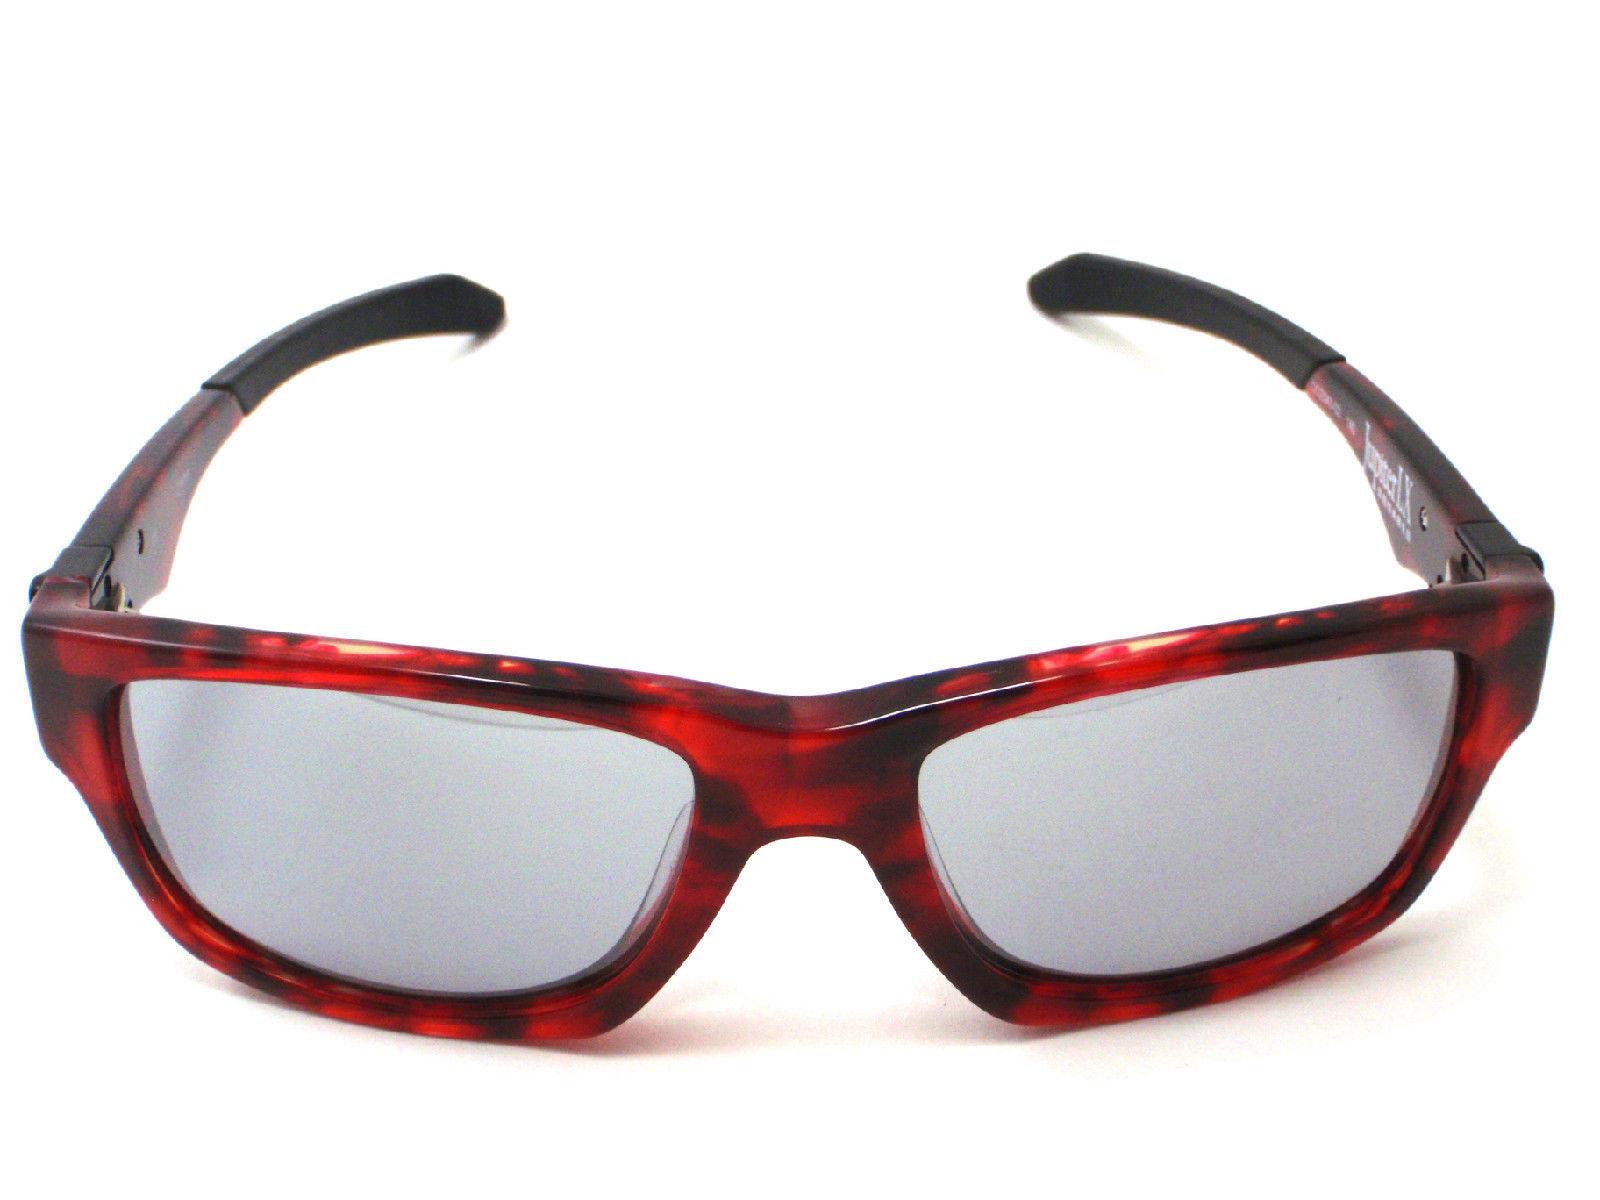 c51c7021511 Oakley Sunglasses Holbrook Nz « Heritage Malta